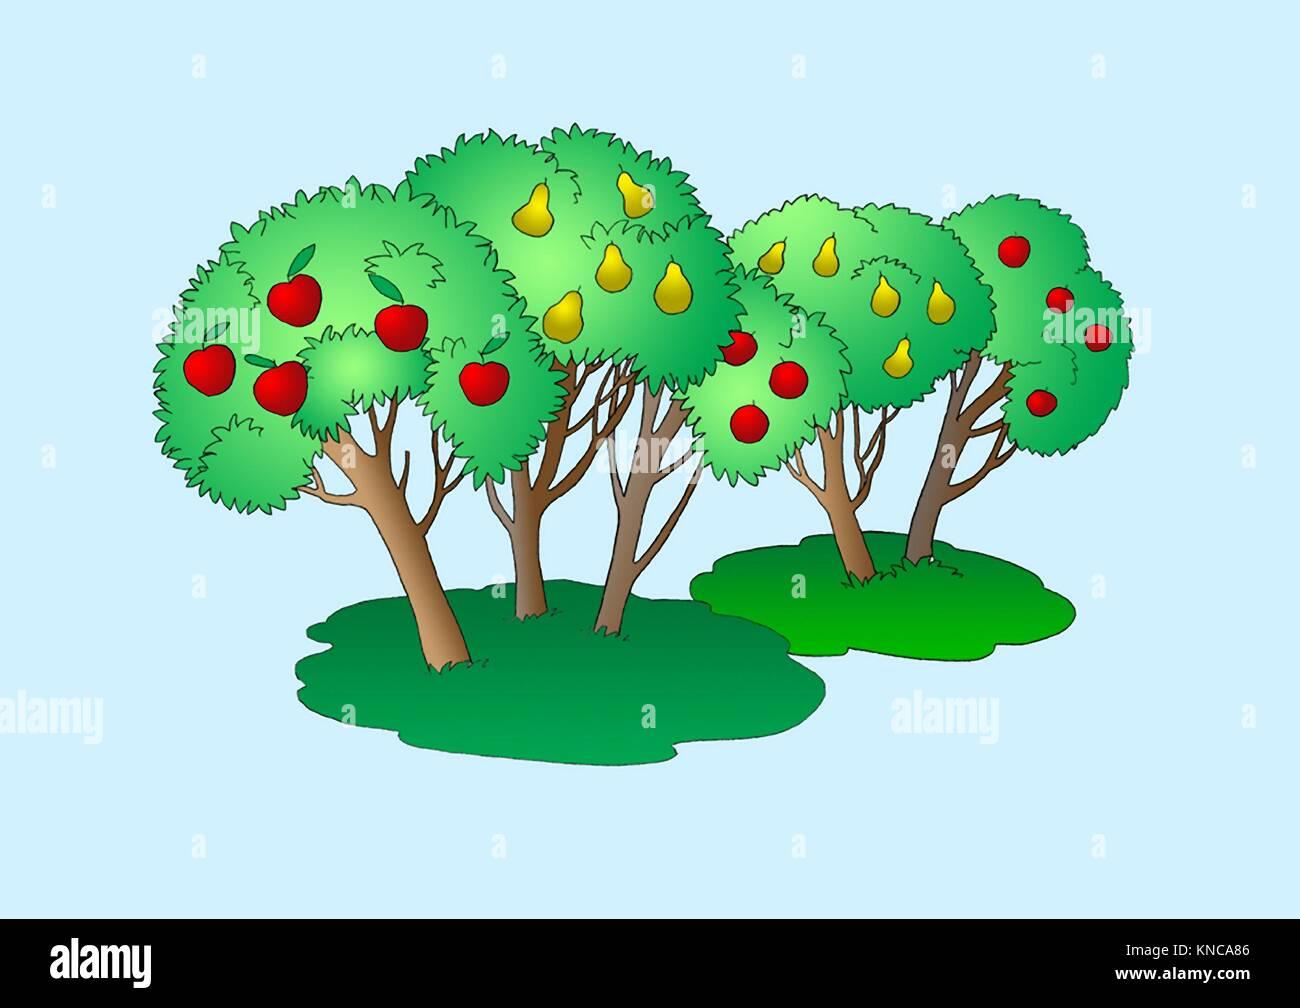 Fruit Trees Illustration. Digital Painting Background, Illustration in primitive cartoon style character. Isolated. - Stock Image